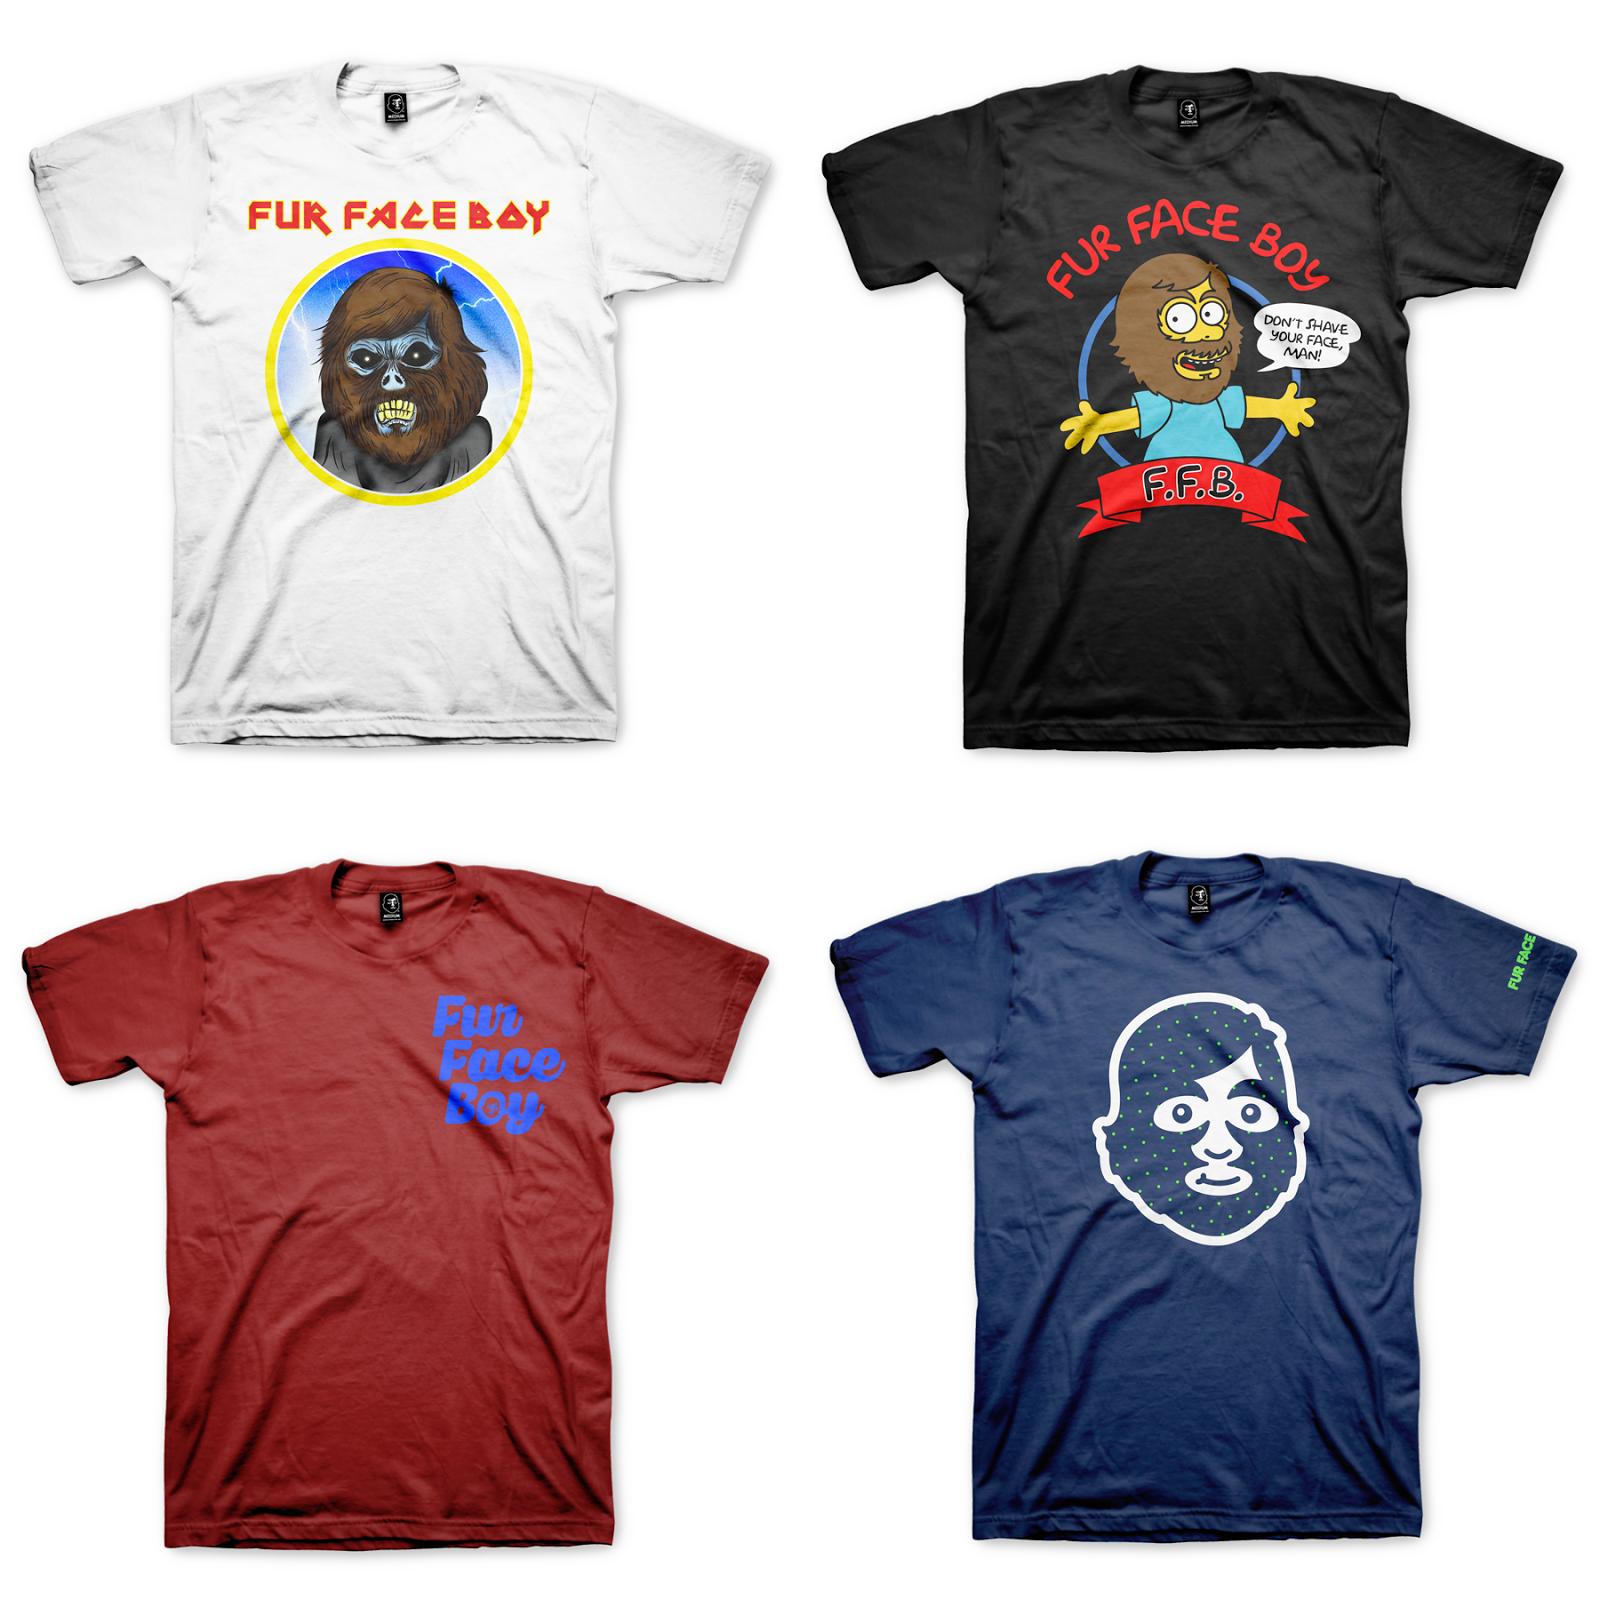 Fur Face Boy 4.0 T-Shirt Collection Series 1